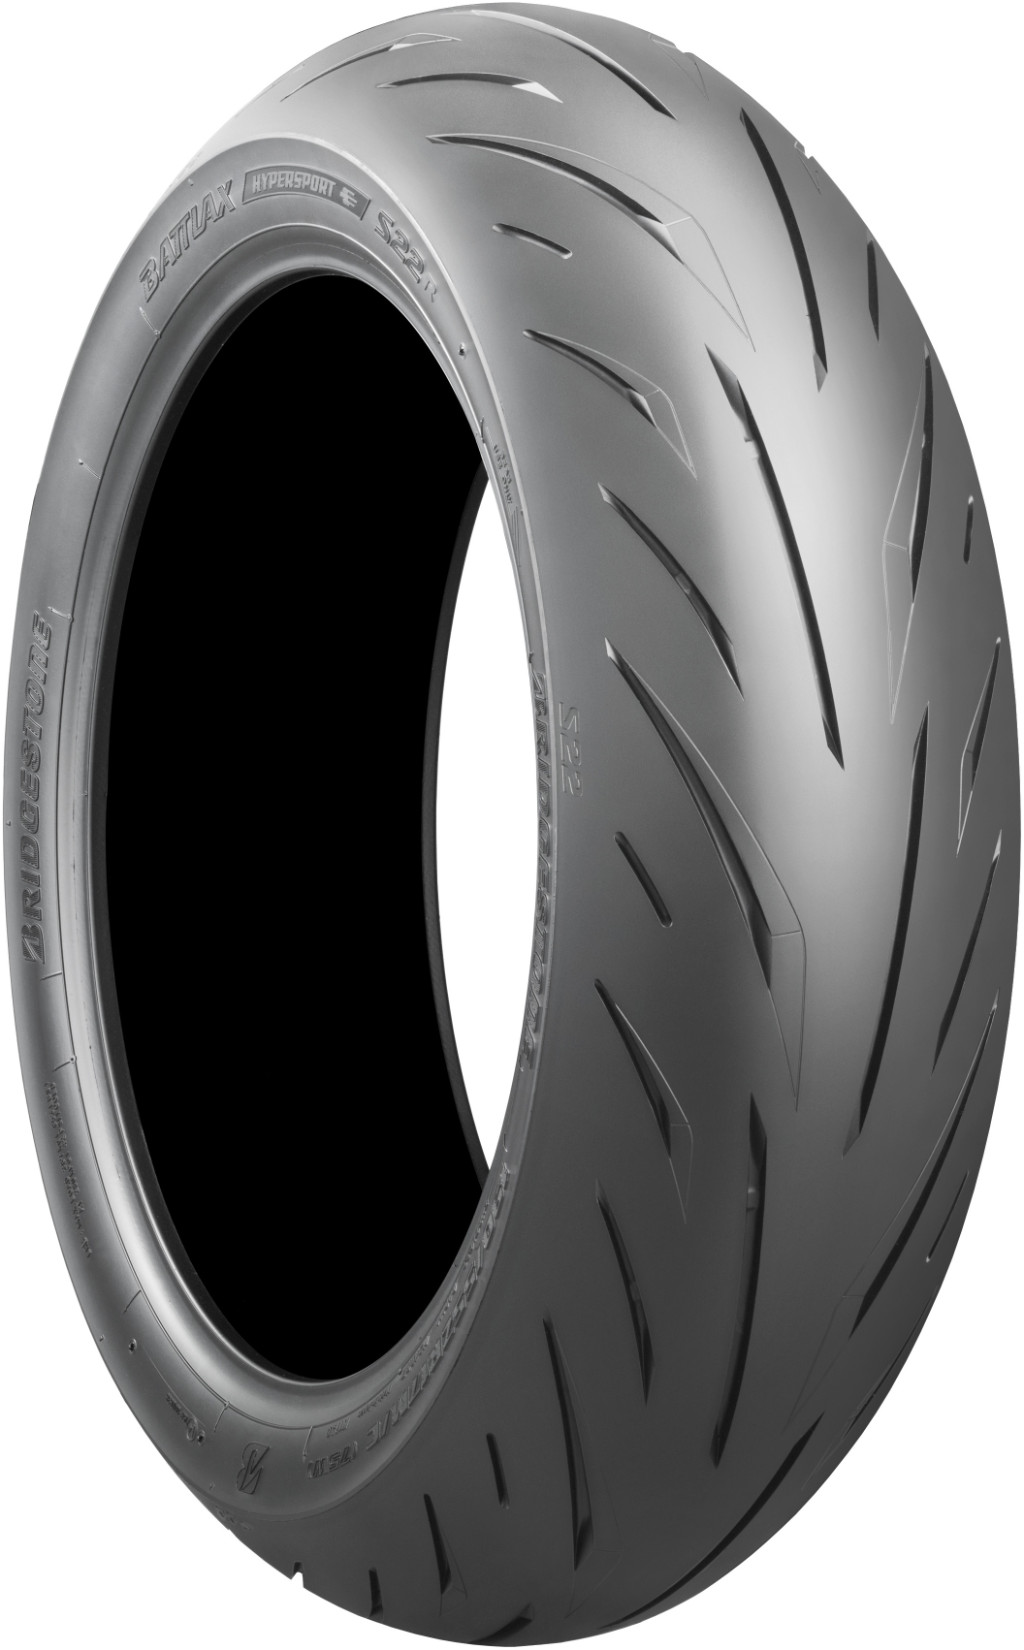 BATTLAX HYPER SPORT S22【190/50ZR17M/C(73W)】バトラックス ハイパースポーツ タイヤ